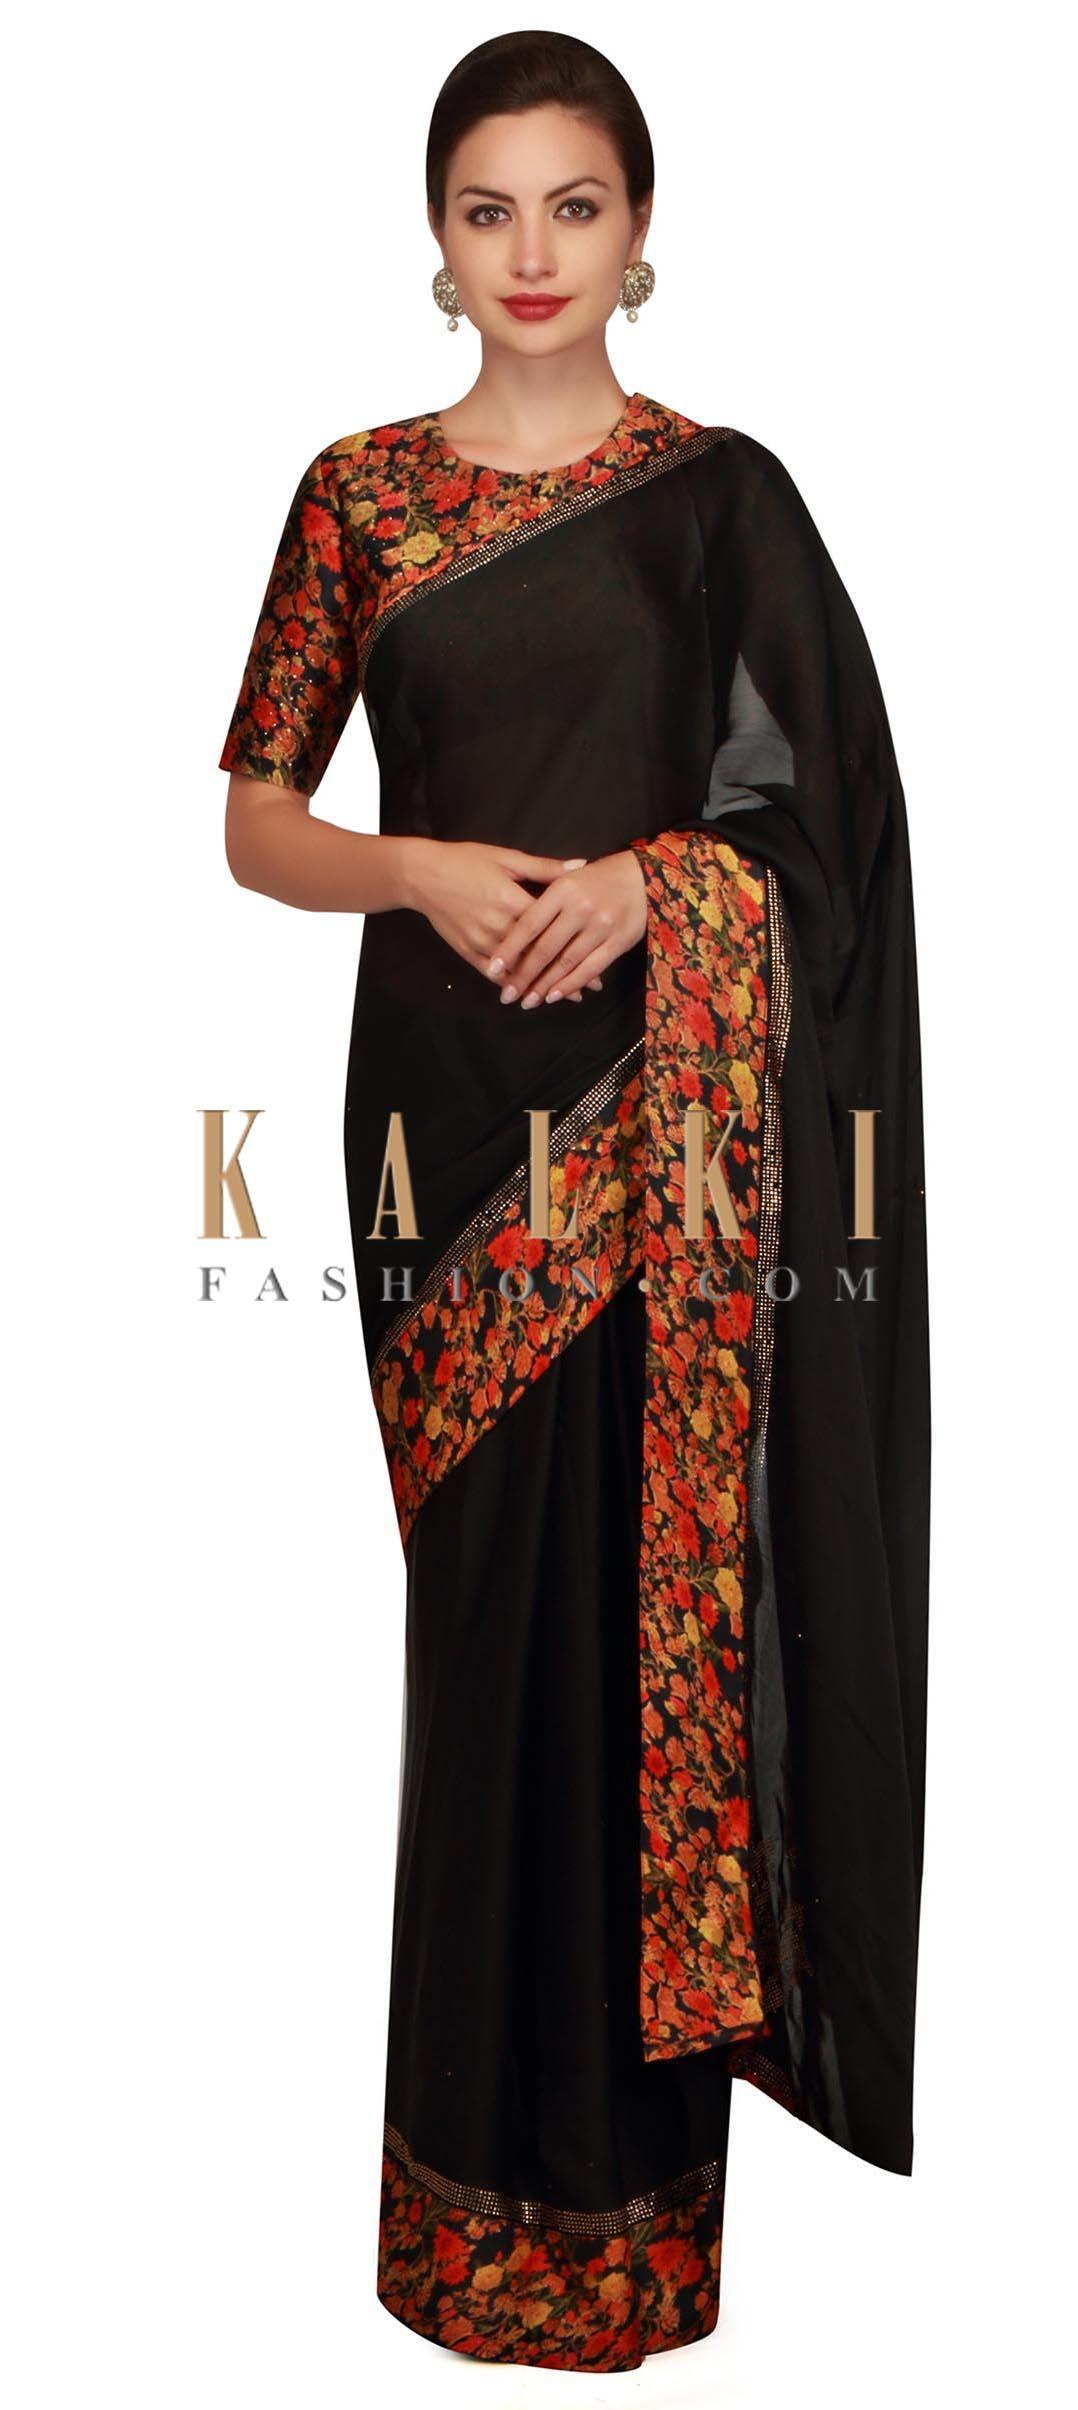 4aaebc0c50 Phantom black saree with floral printed border and kundan only on Kalki